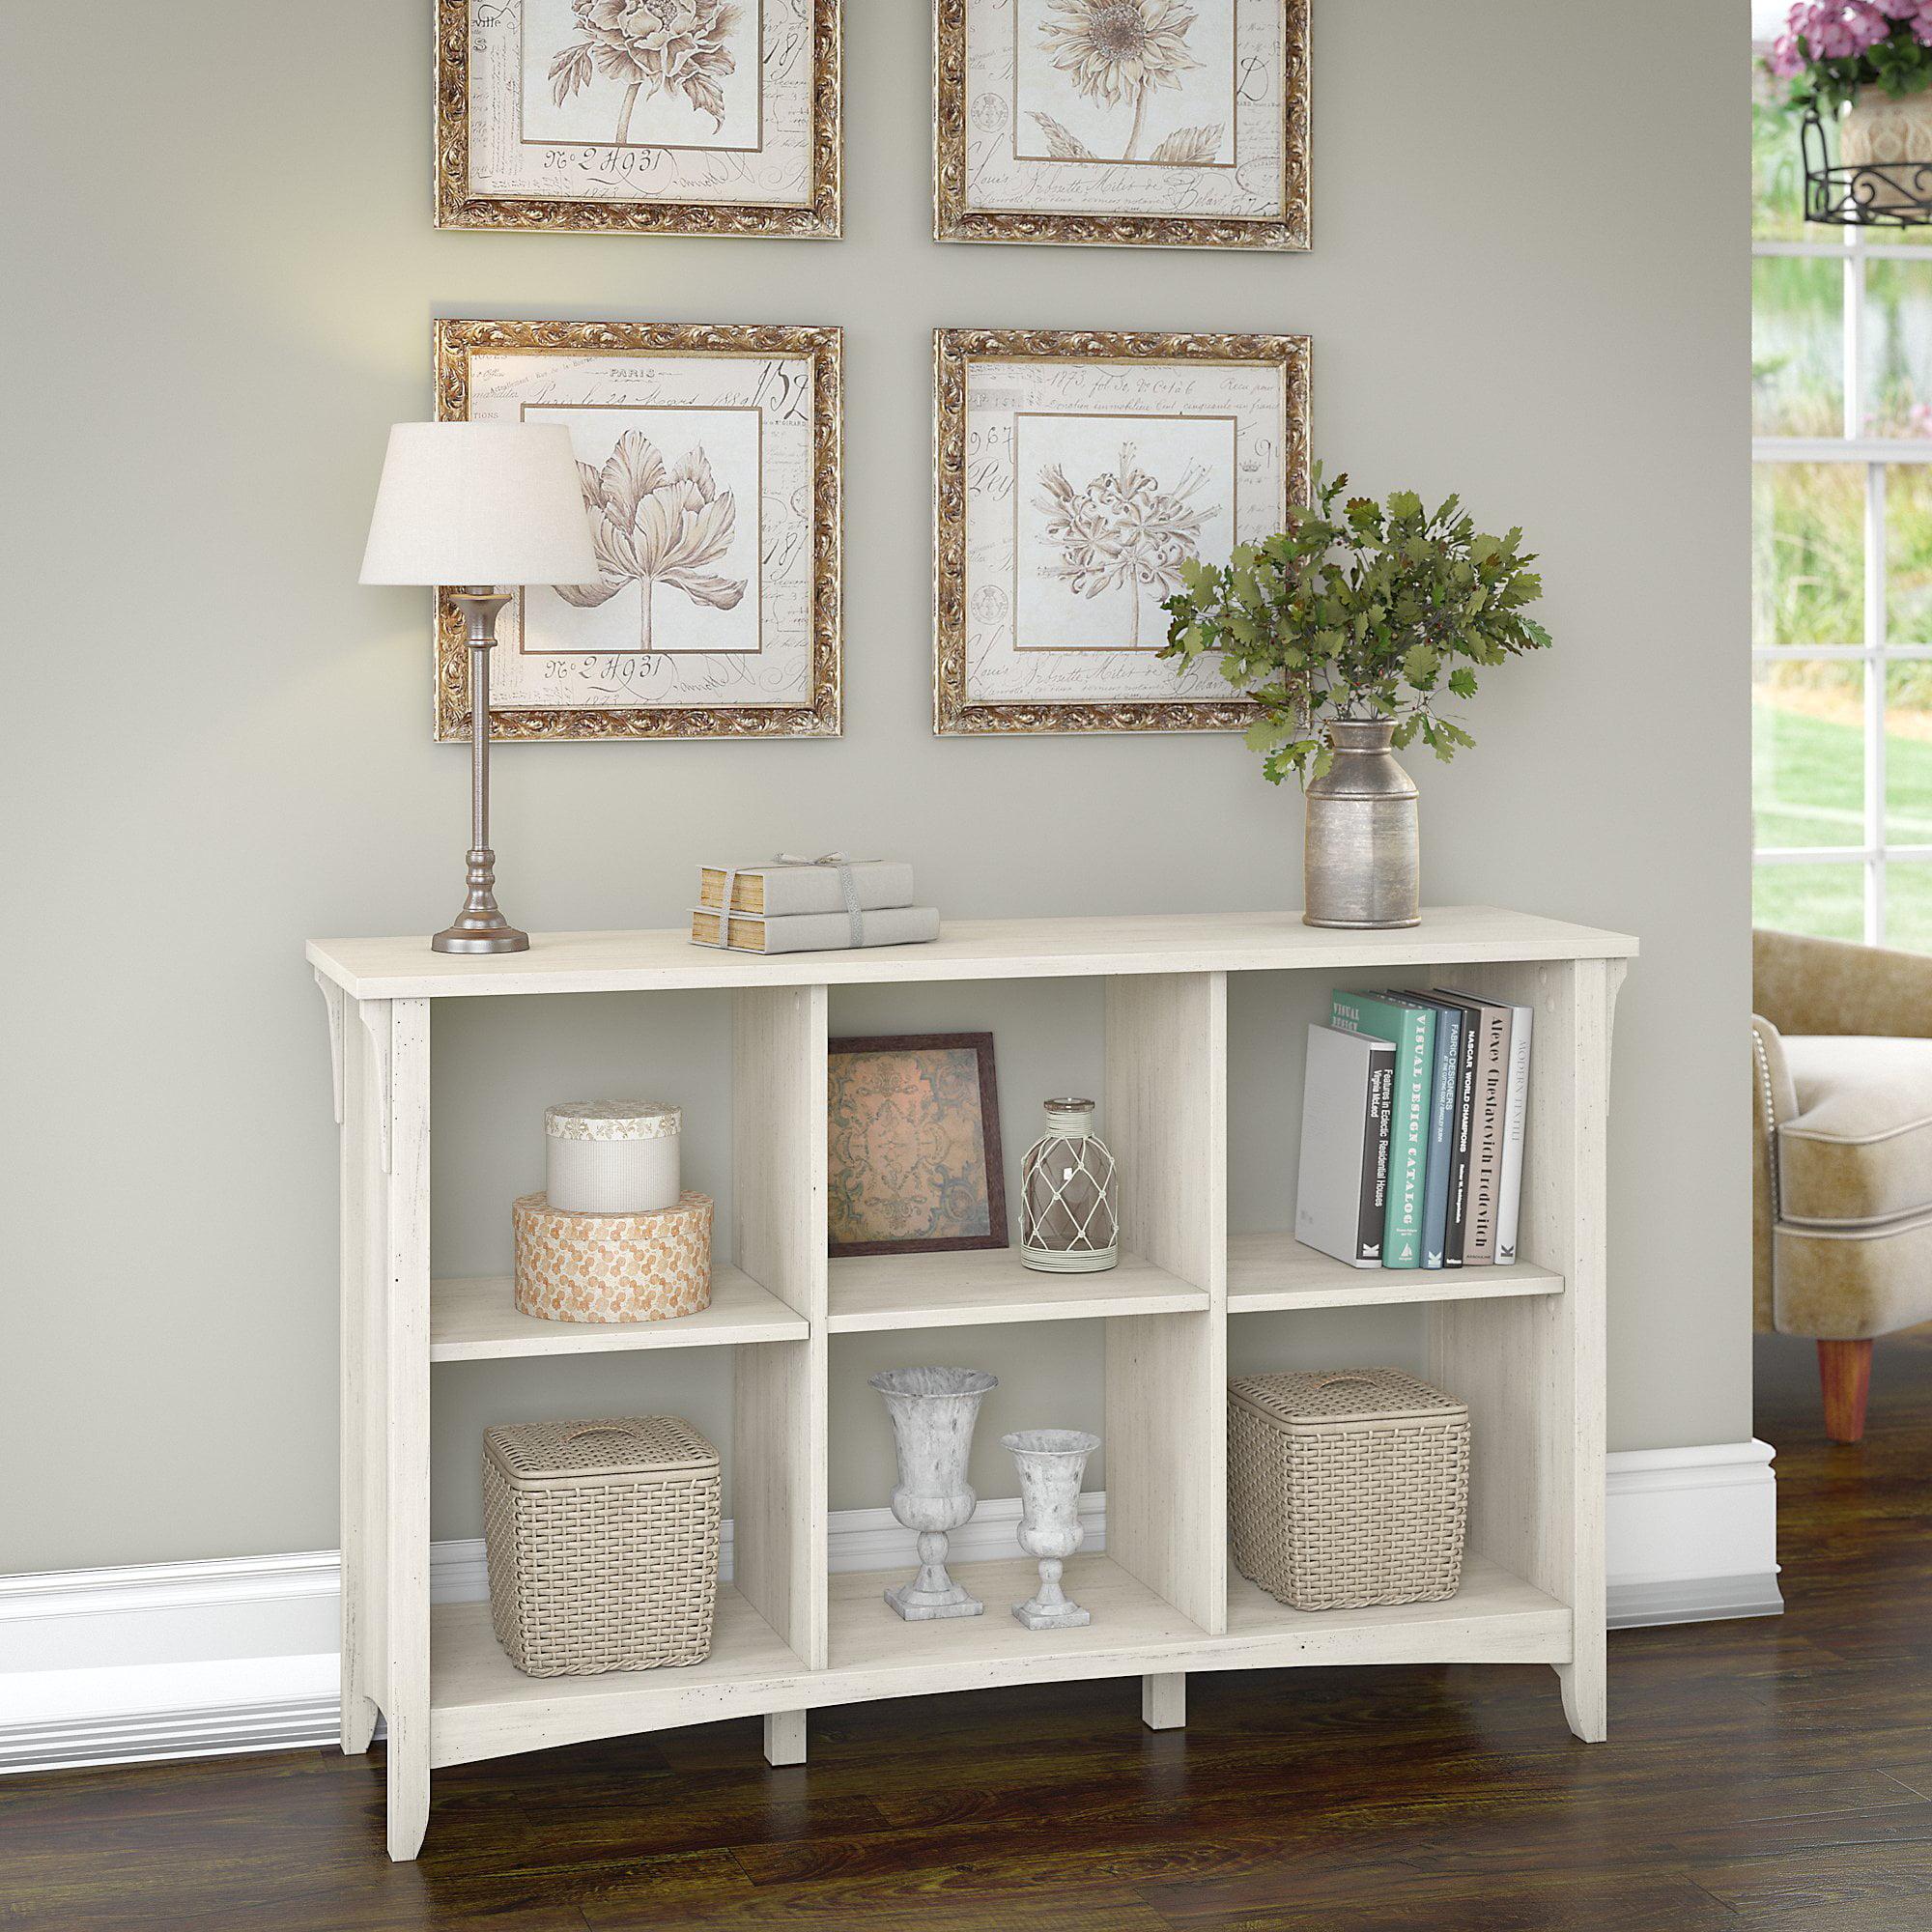 Bush Furniture Salinas Wood 6 Shelf Cube Organizer In